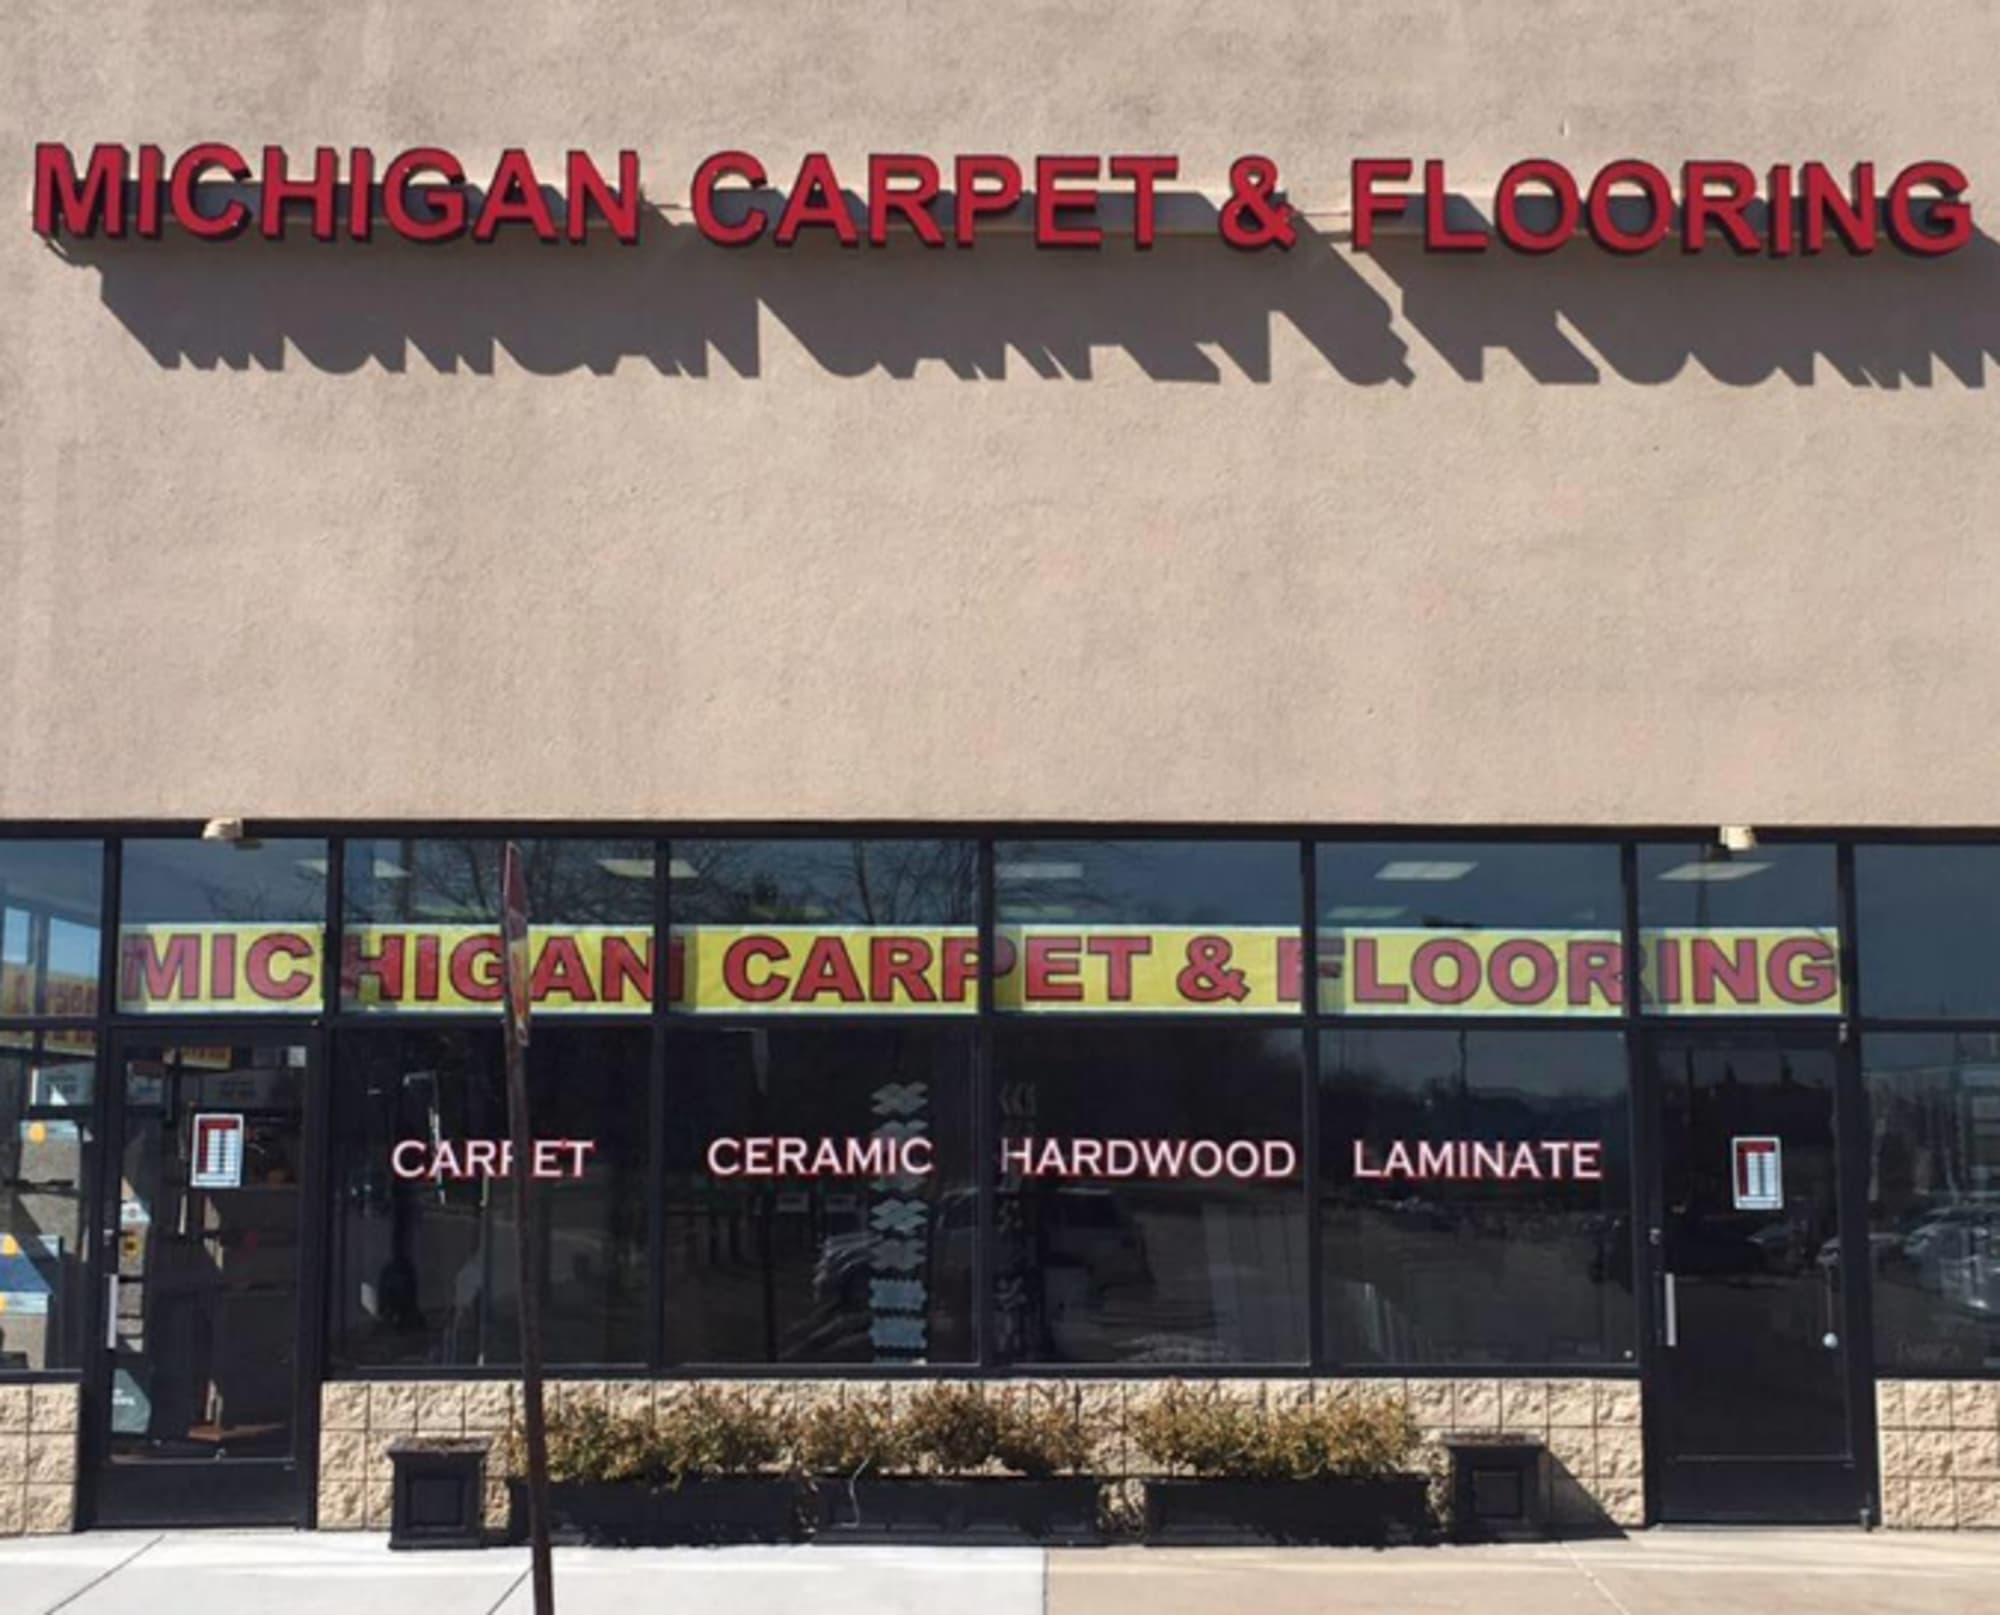 Michigan Carpet and Flooring - 465 Haggerty Rd Commerce Charter Township, MI 48390